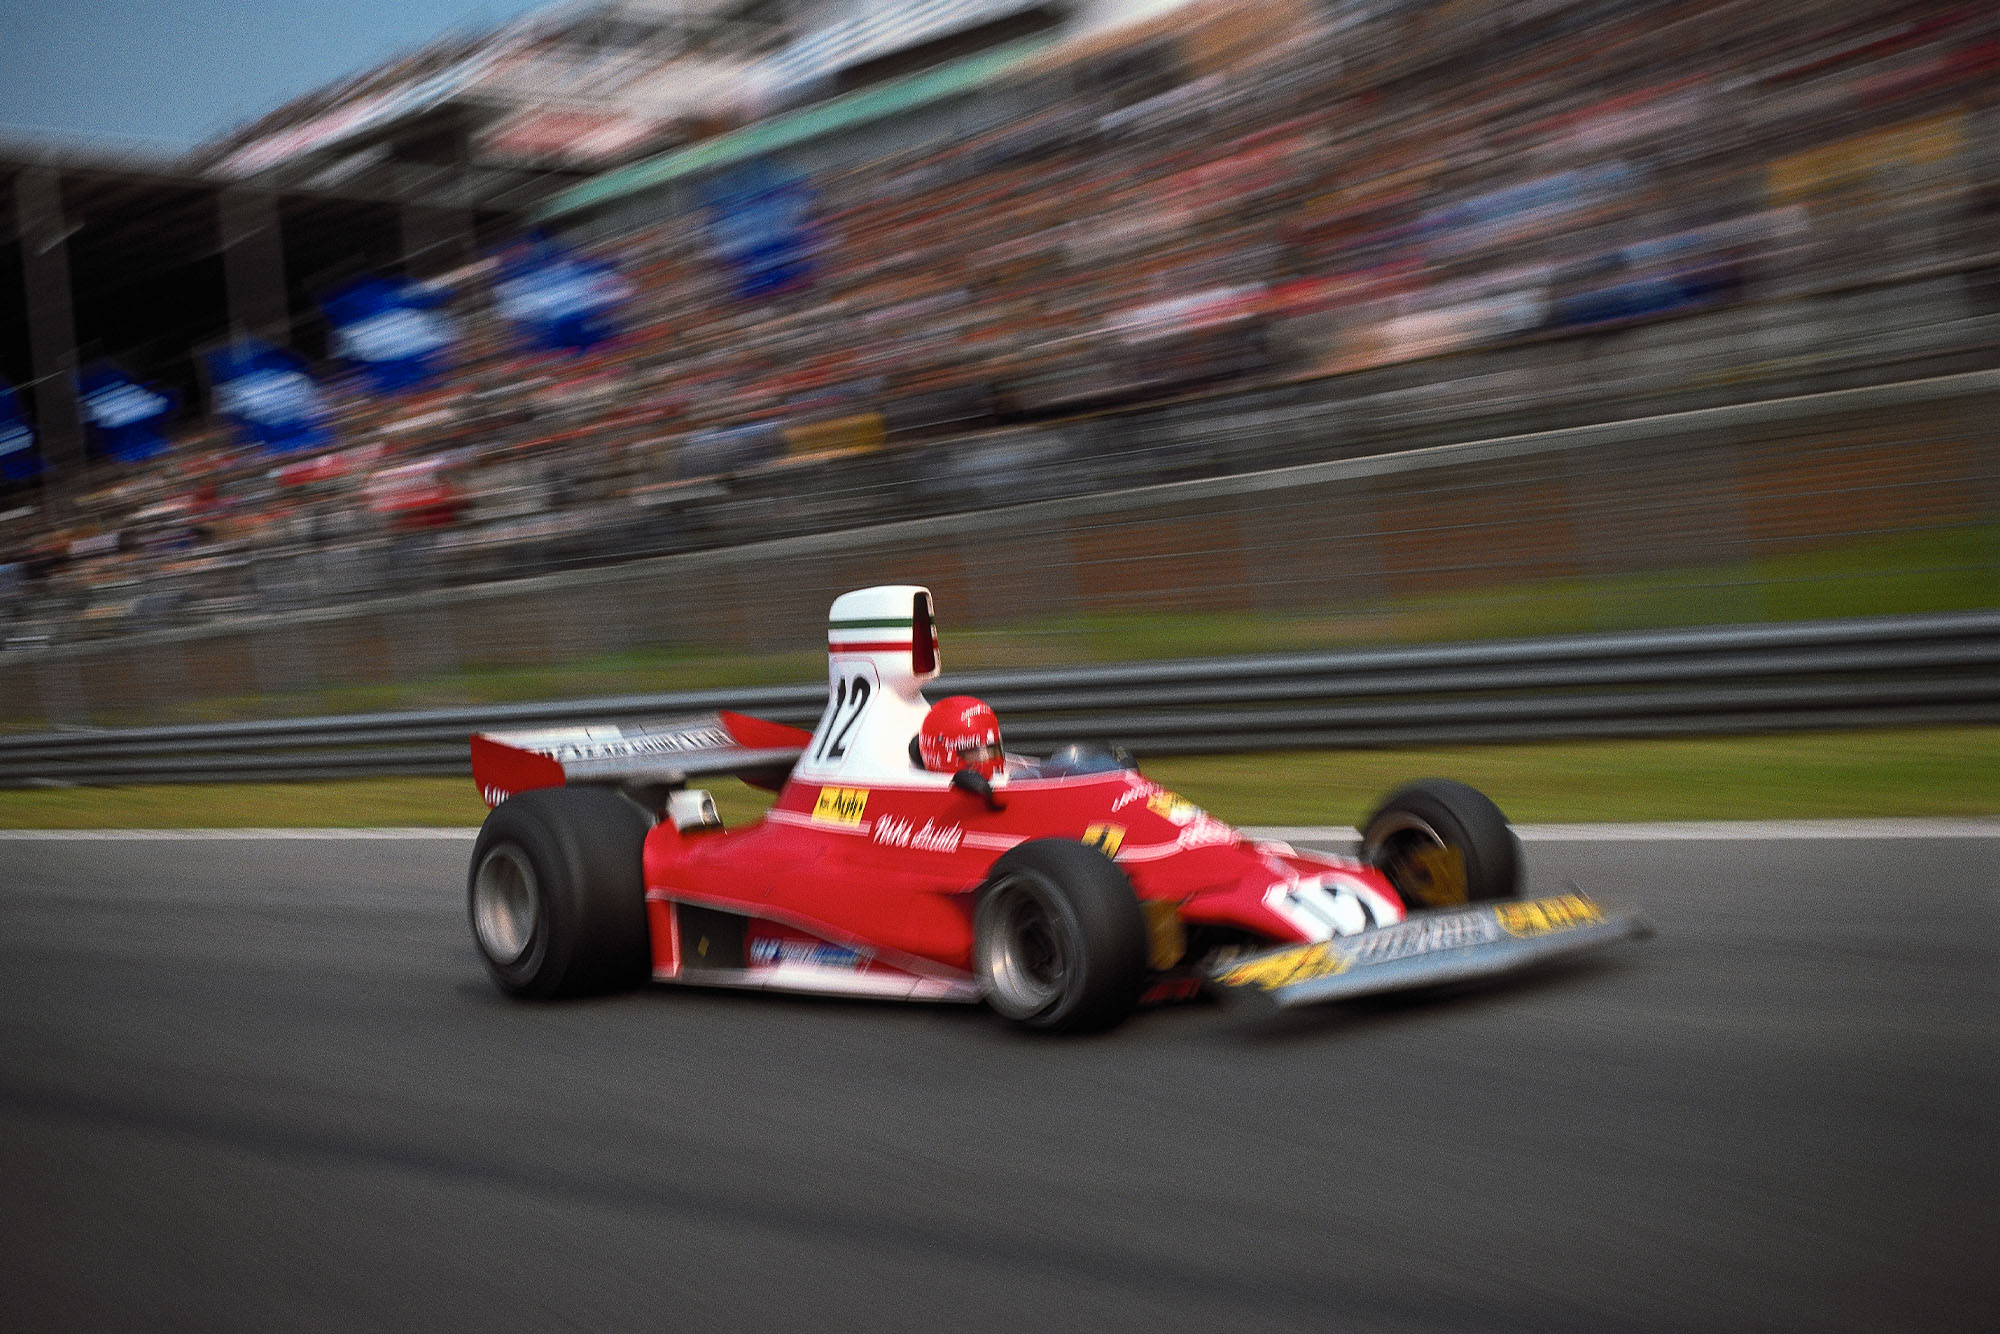 Niki Lauda (Ferrari) at speed at the 1975 Belgian Grand Prix, Zolder.